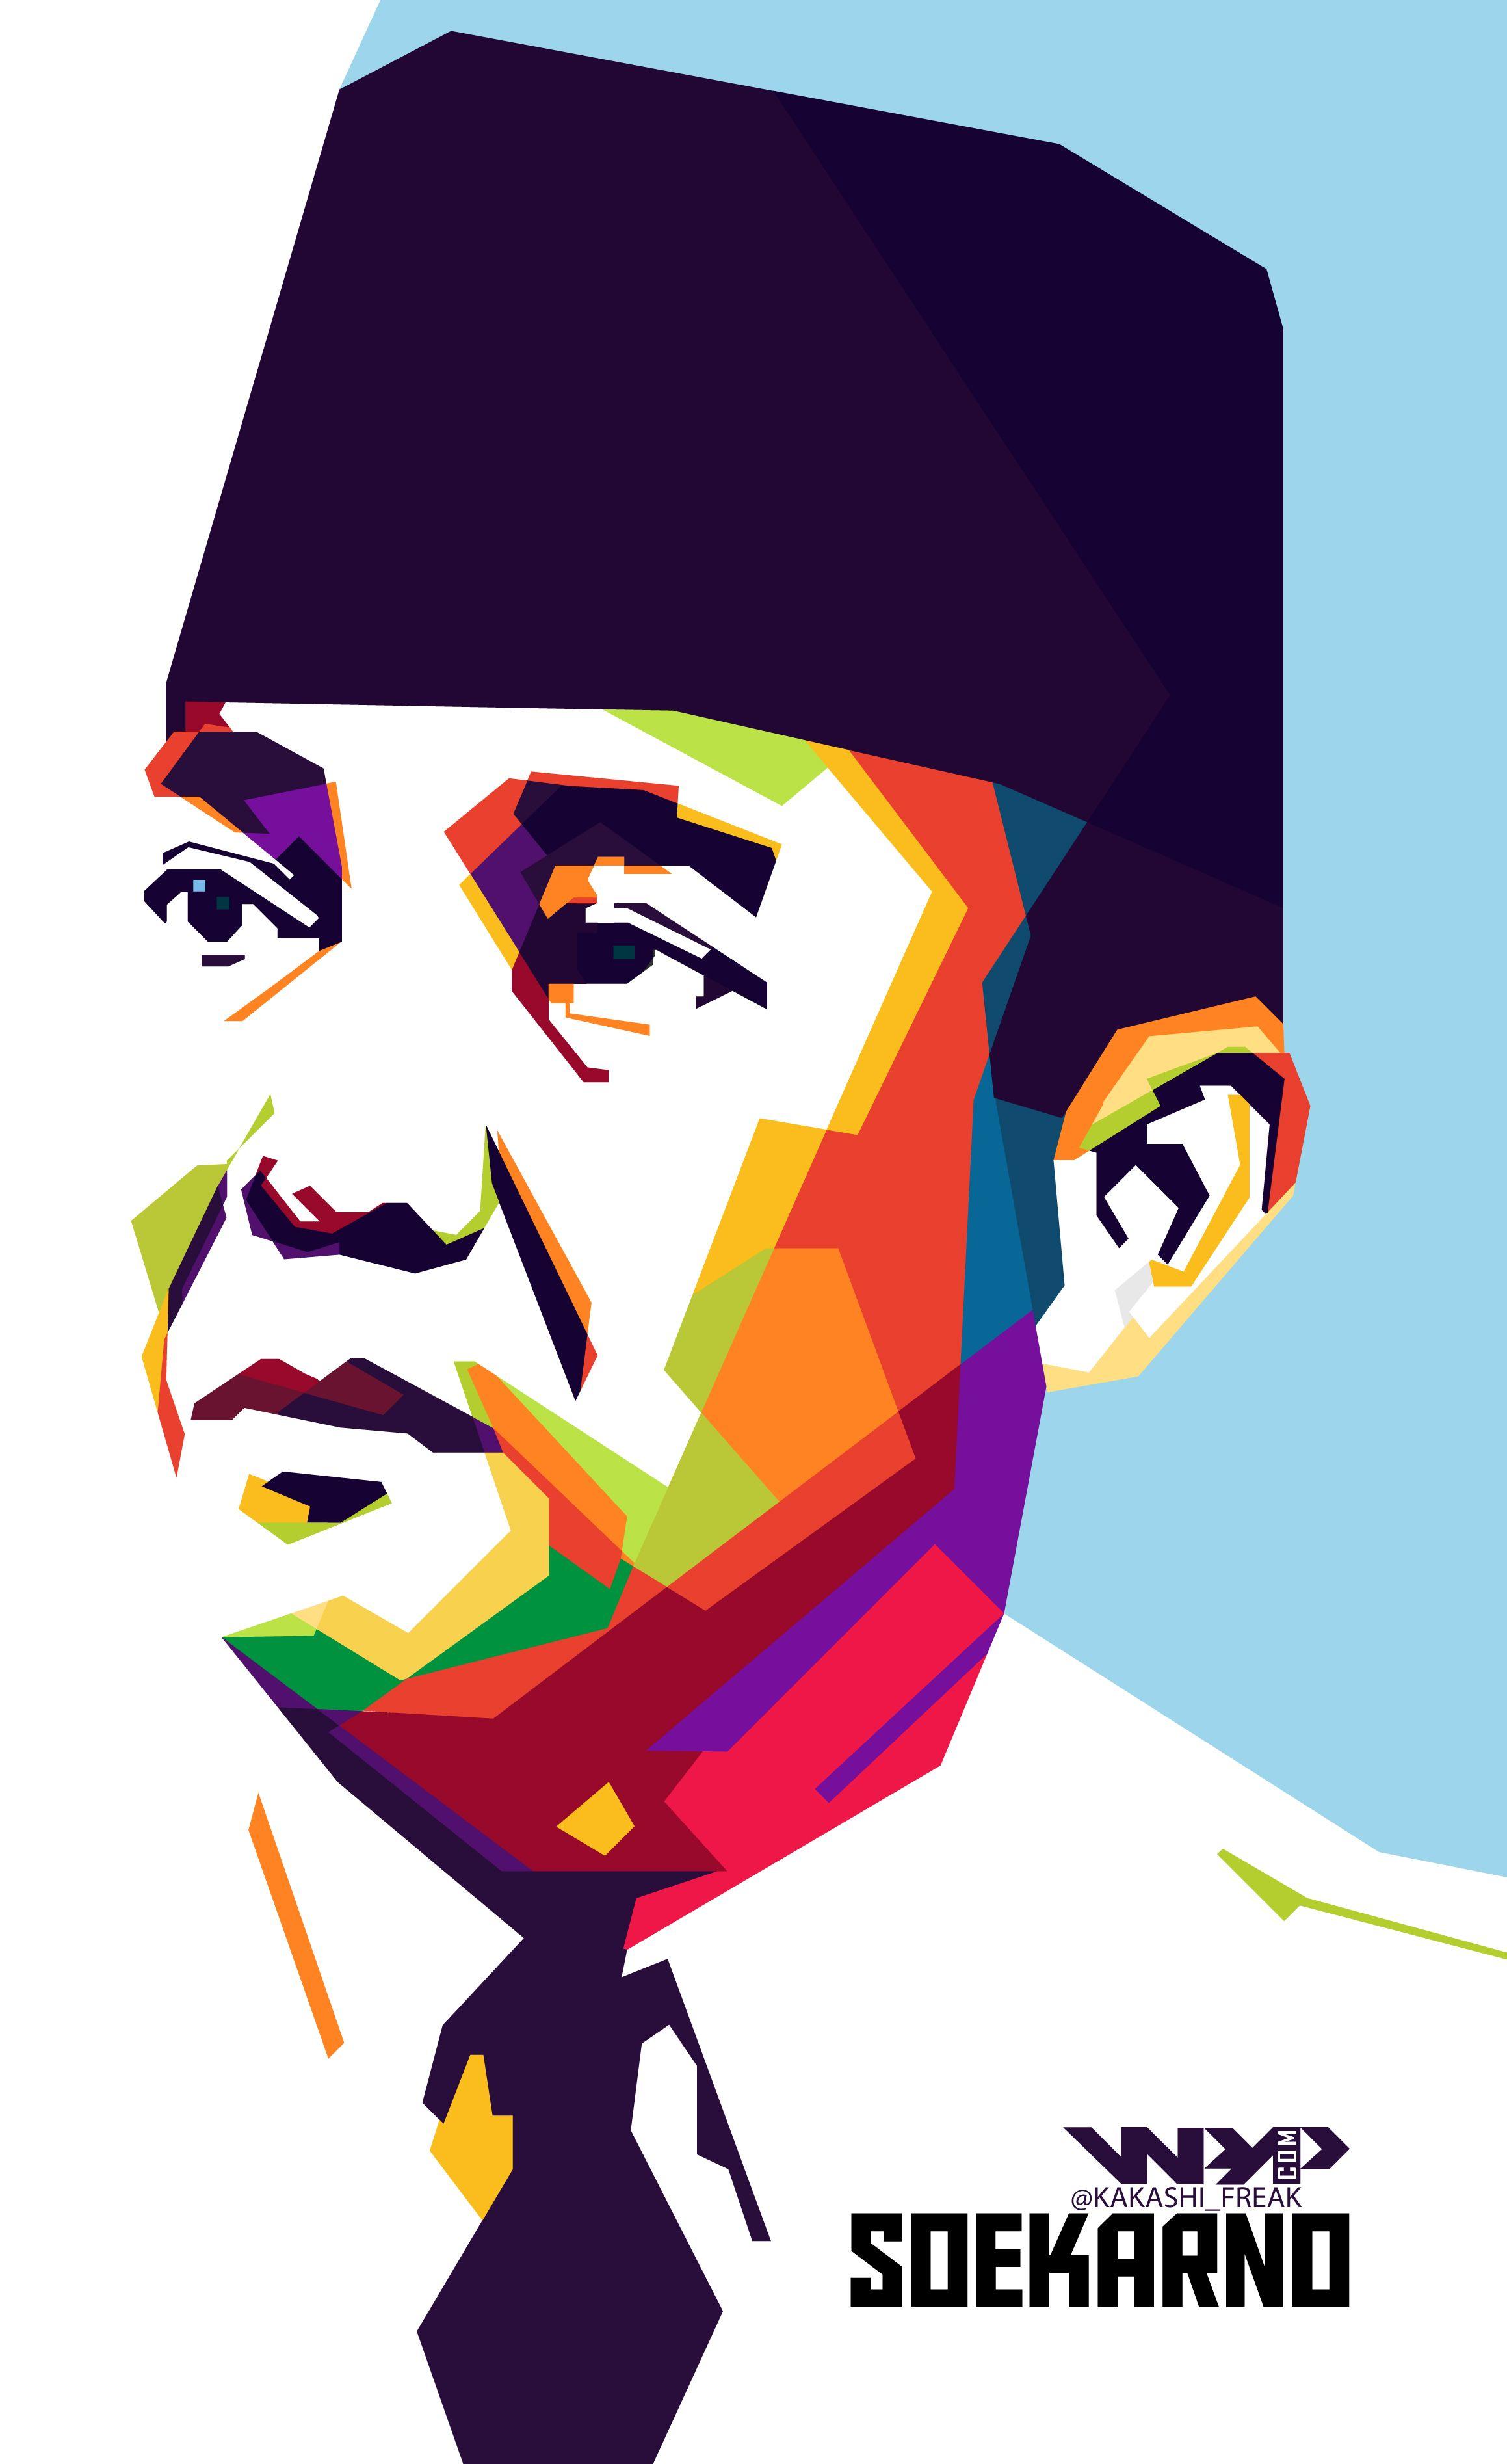 Gambar Hd Pahlawan Indonesia